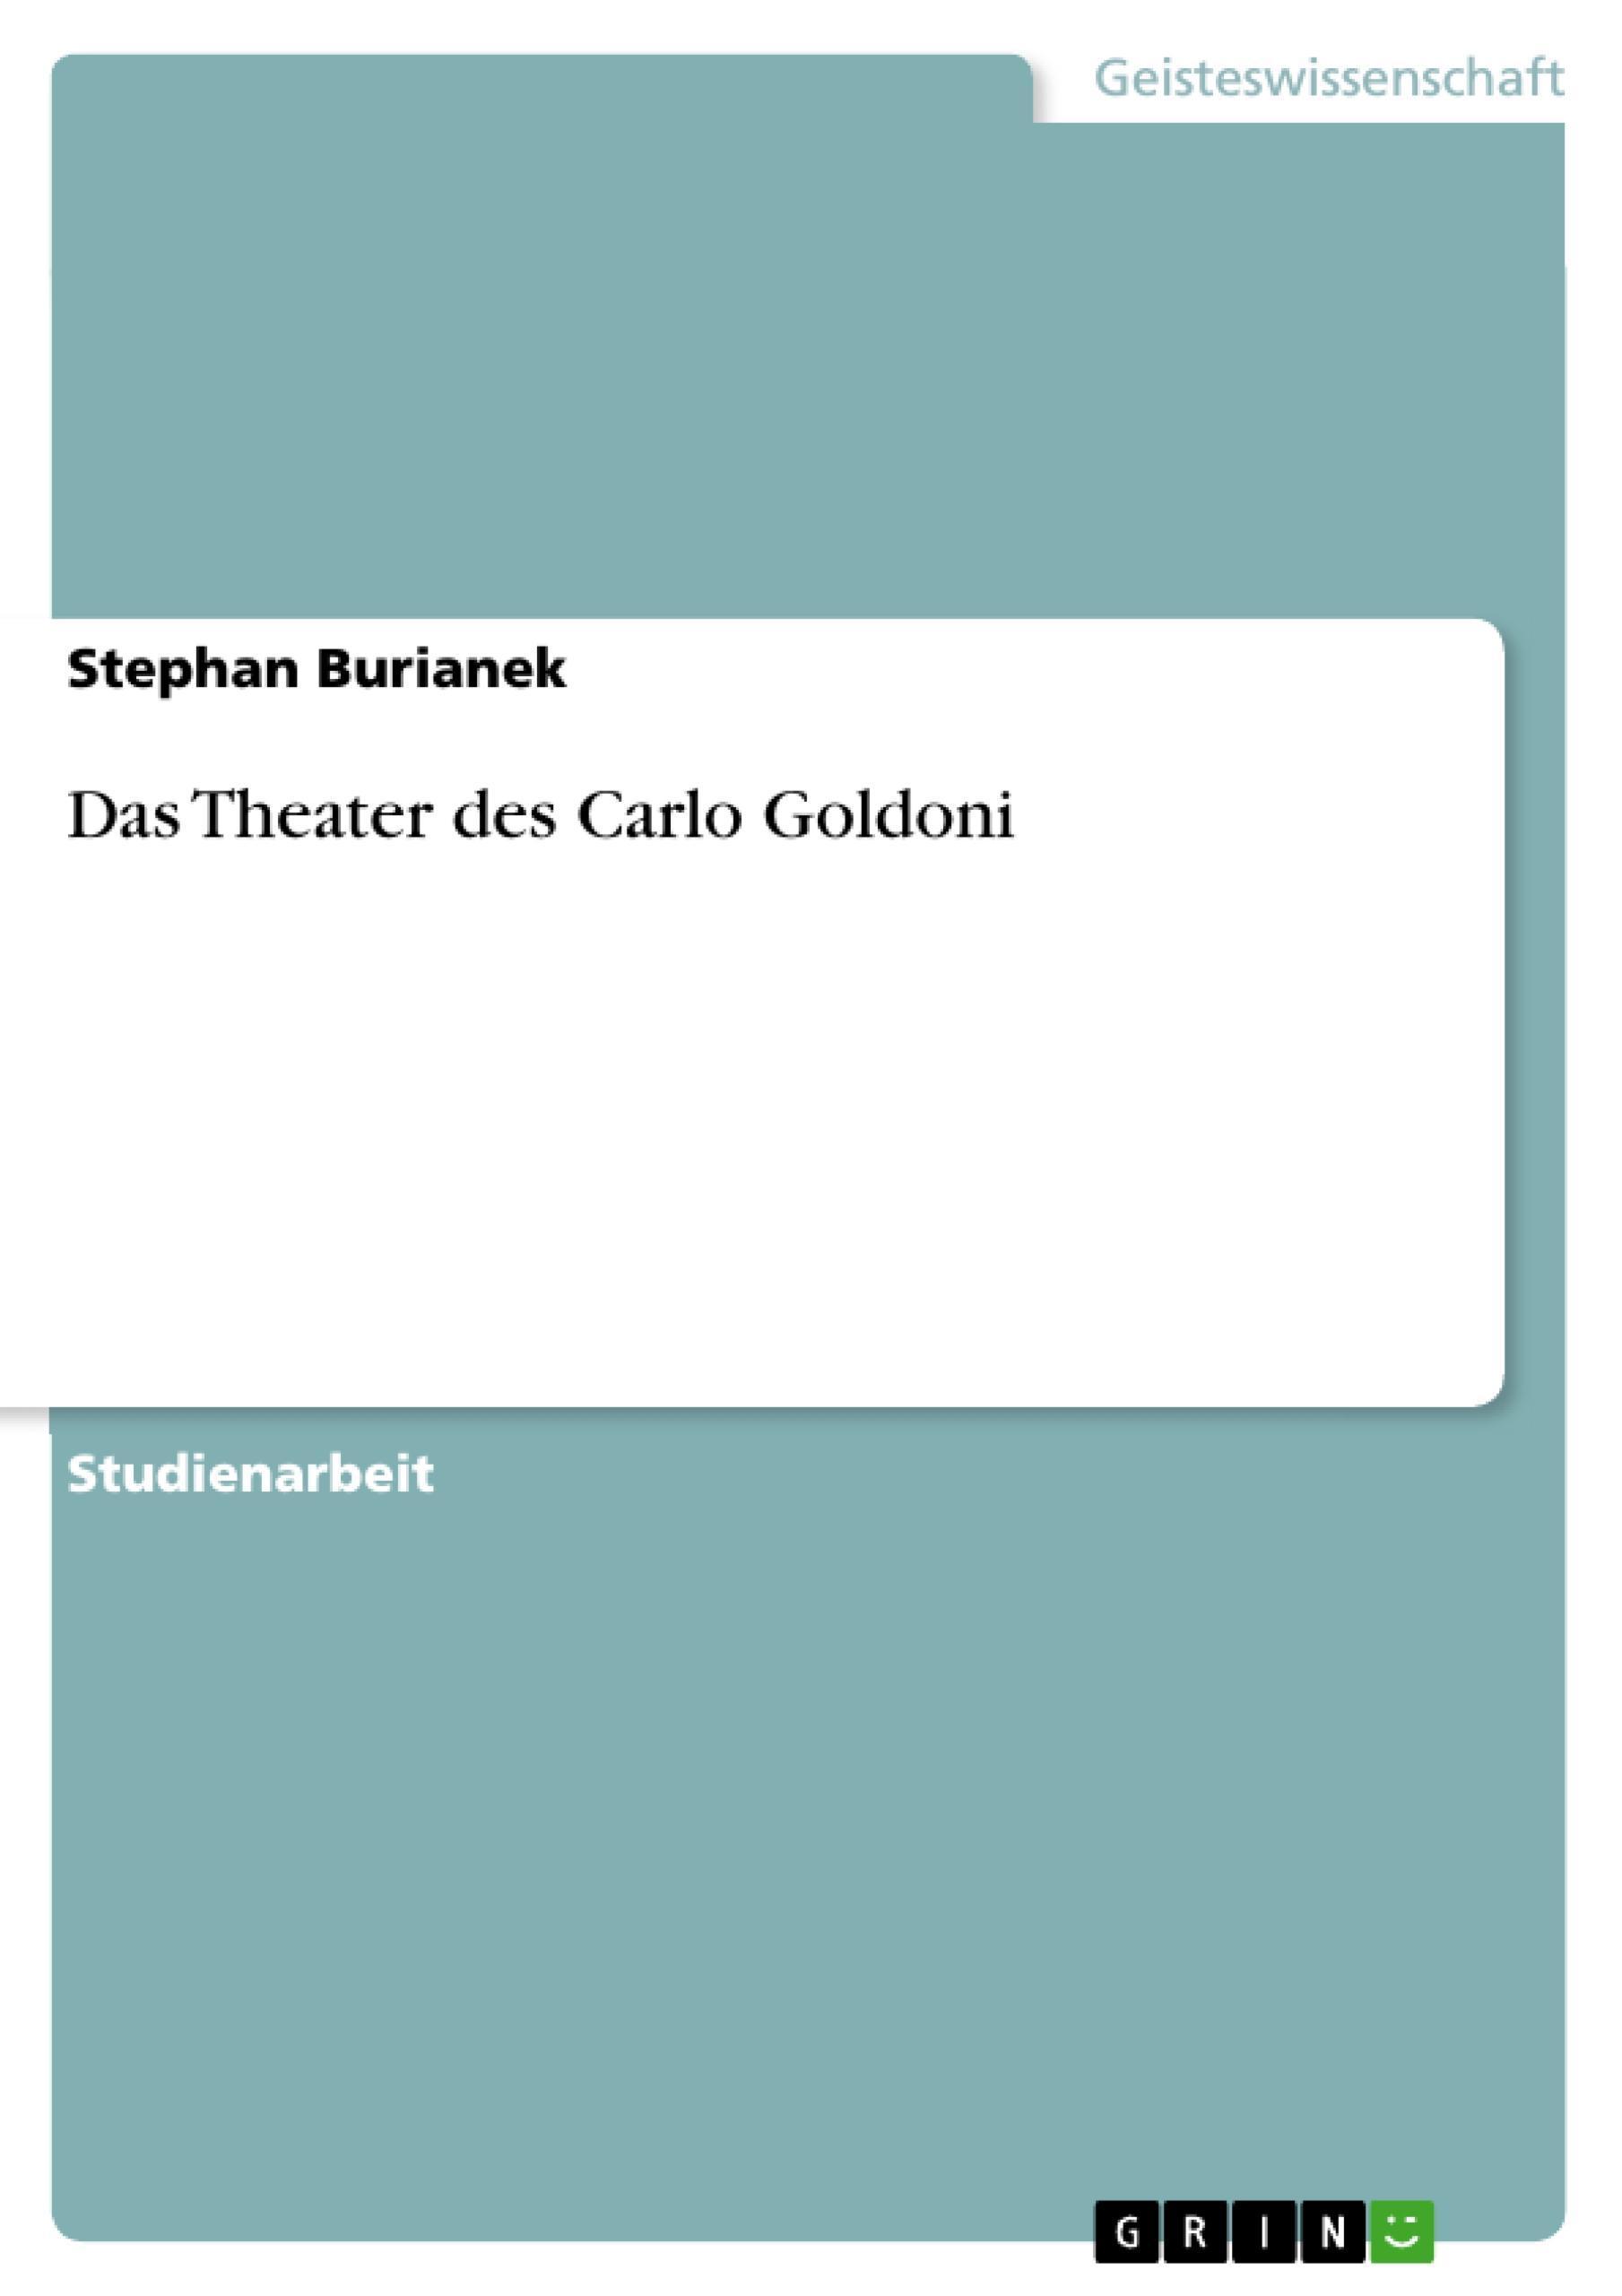 Das Theater des Carlo Goldoni Stephan Burianek